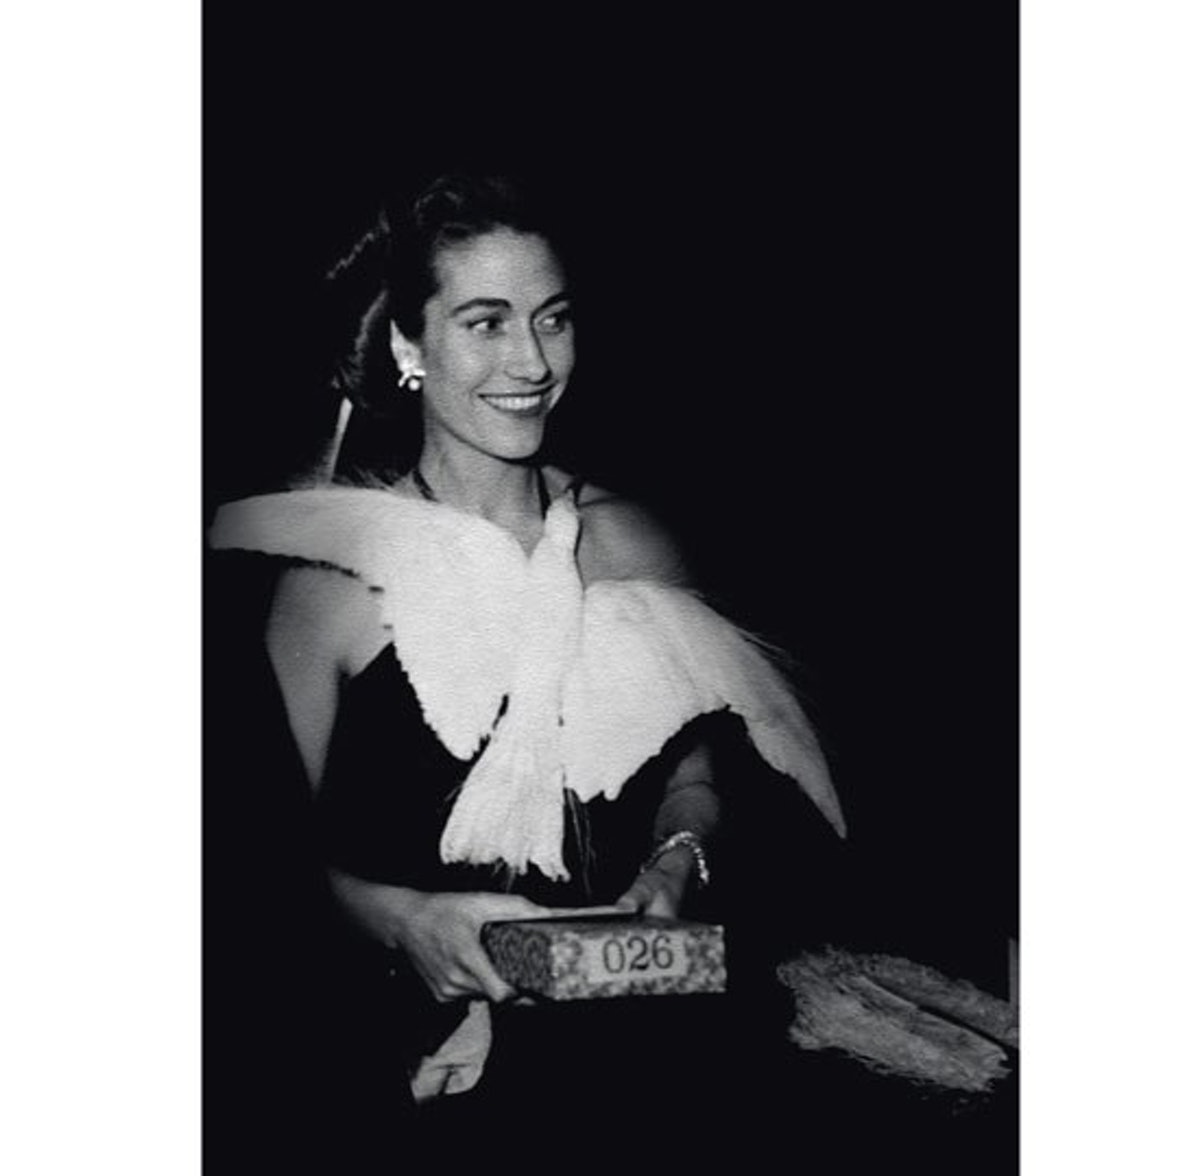 blog-Helene-Rochas-portant-la-robe-%27Oiseau-creee-par-Marcel-Rochas-en-1934-et-poursuivie-jusquen-1950.jpg